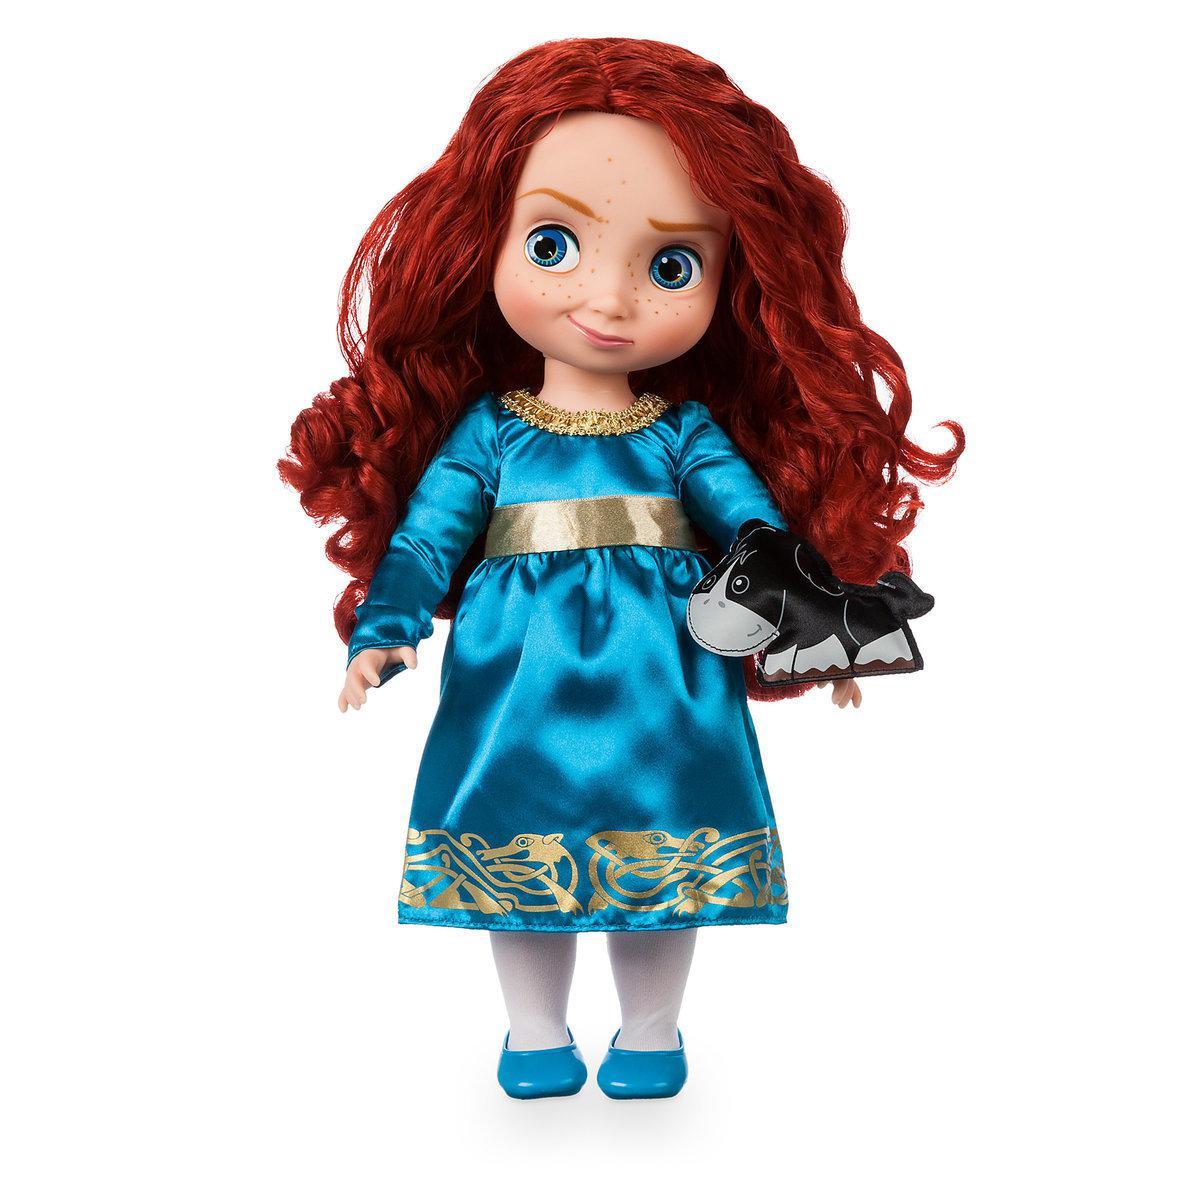 Disney Animators Дисней Аниматор Кукла принцесса малышка Мерида